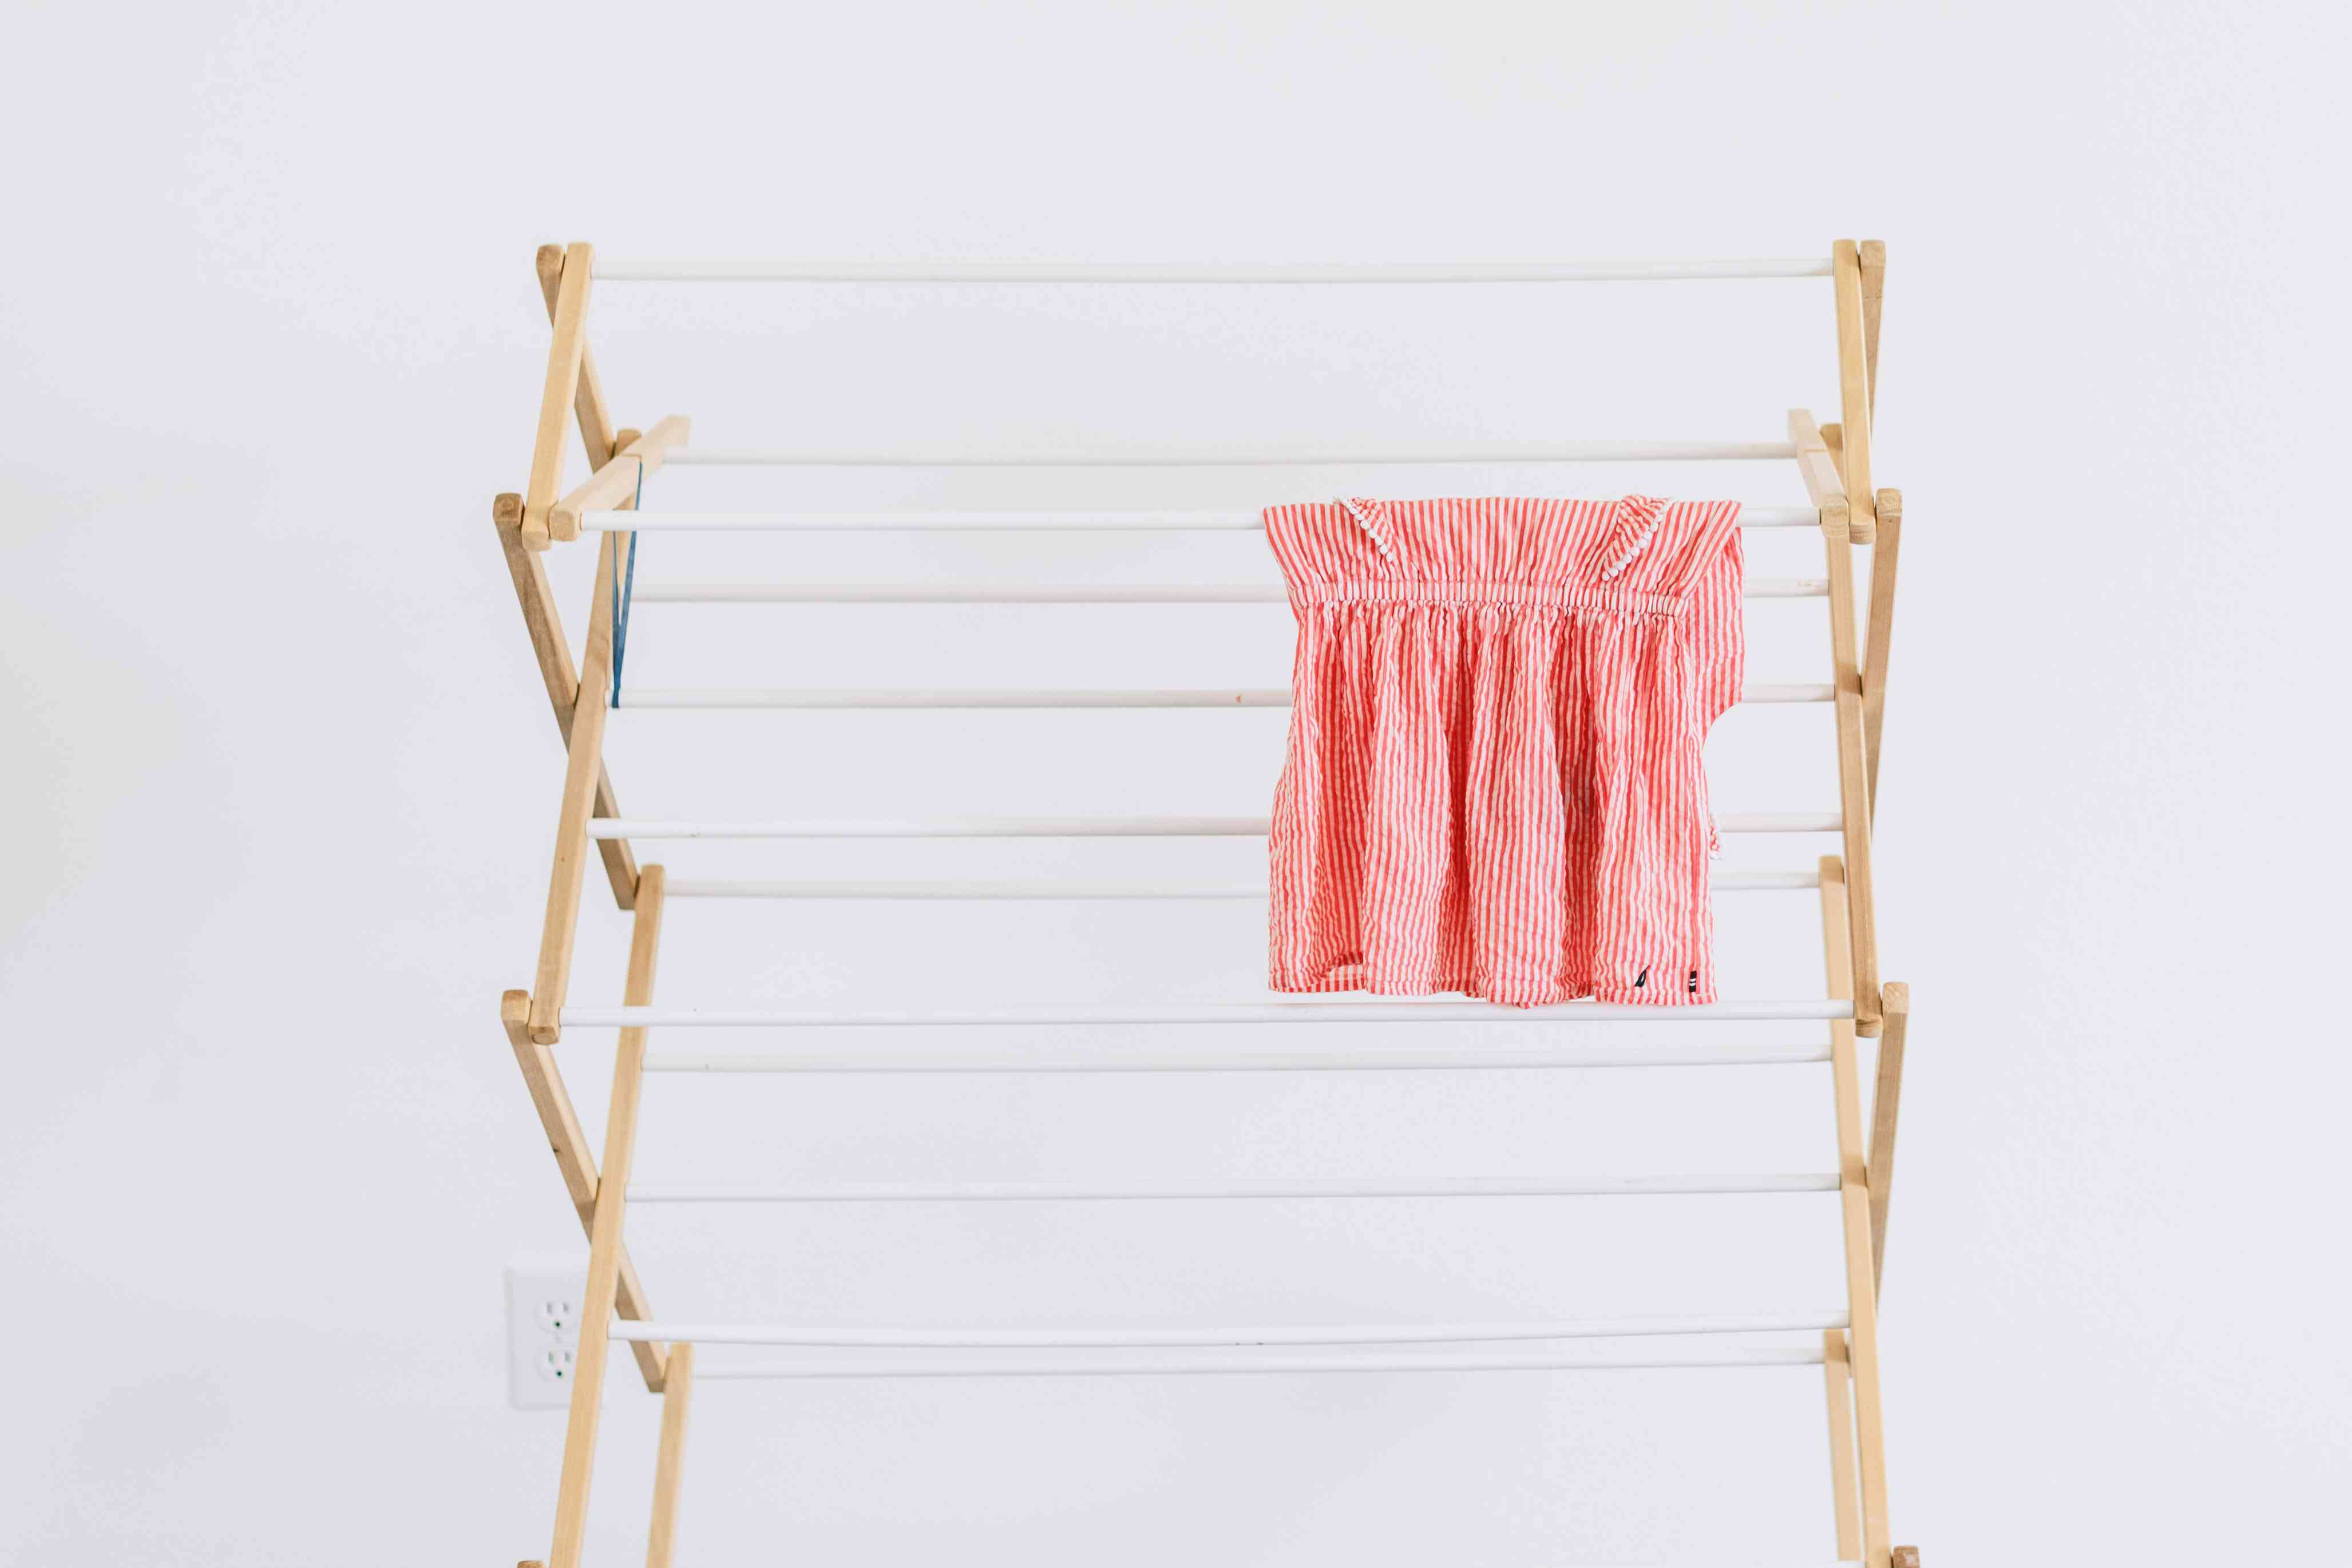 garment air drying on a rack